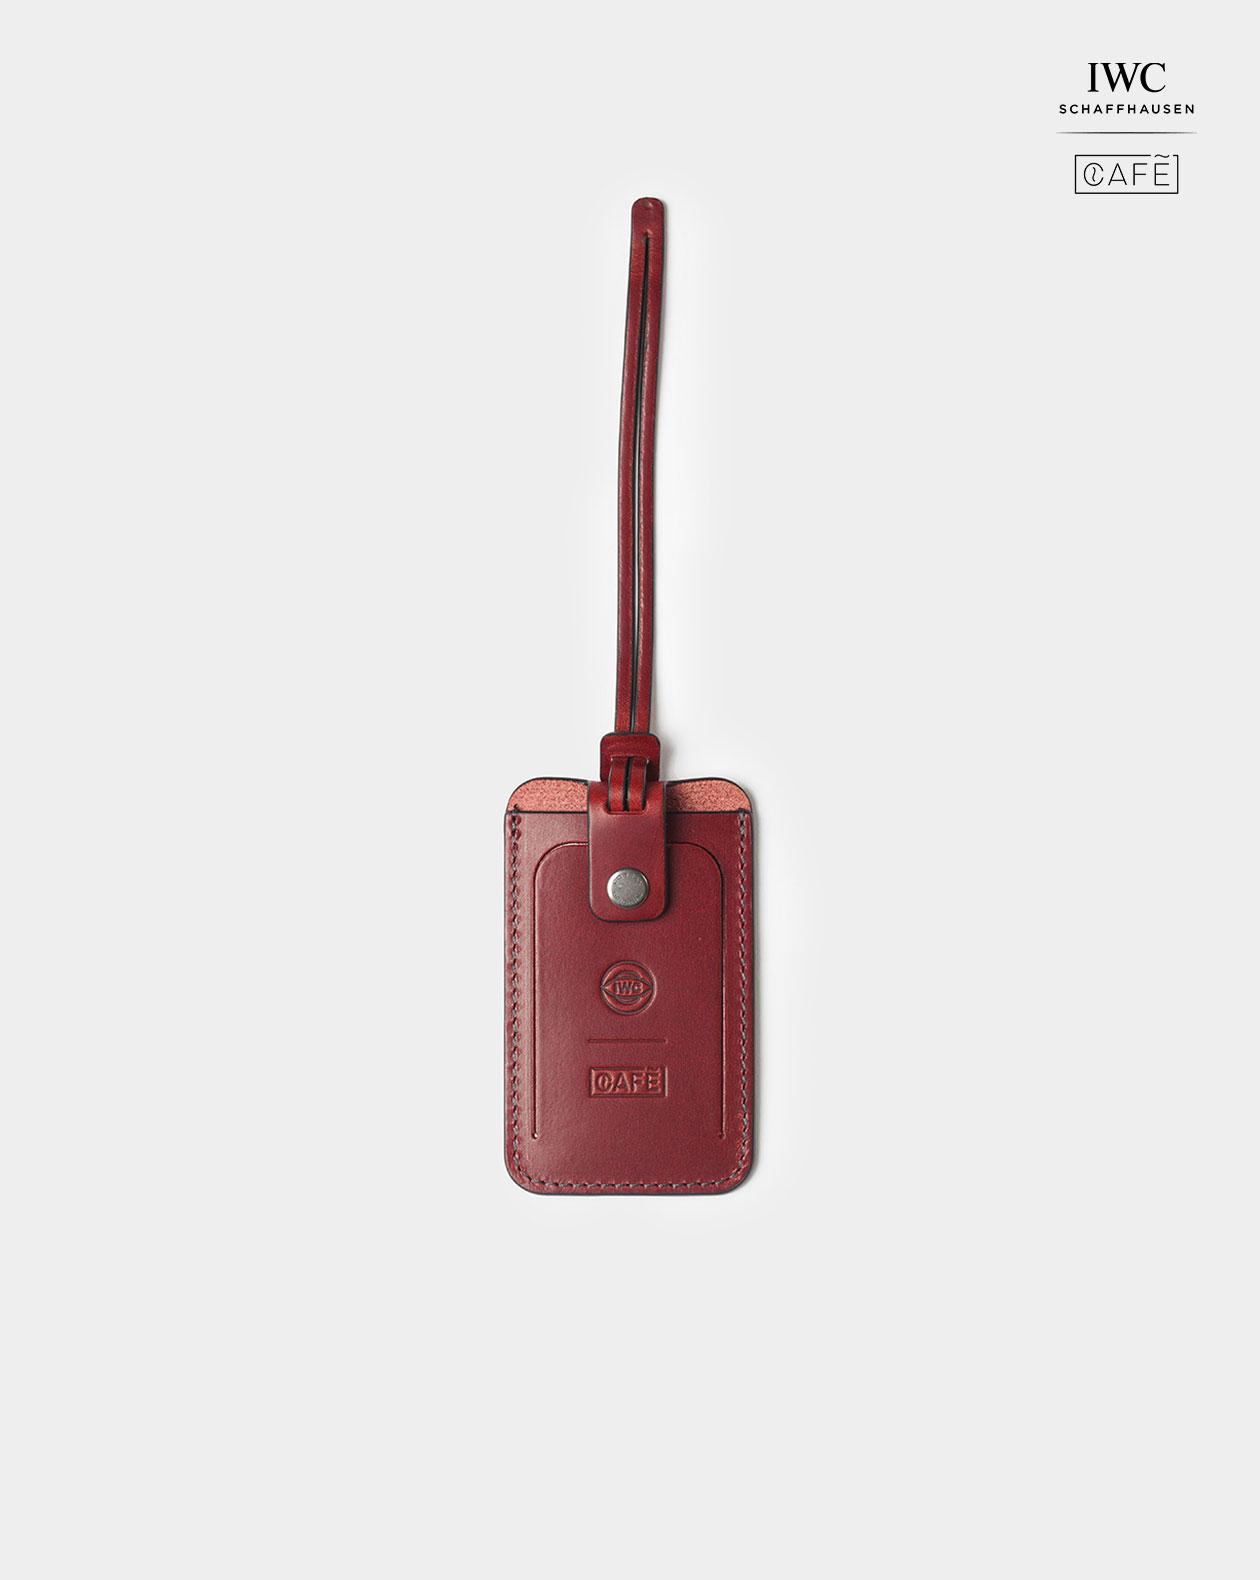 iwc luggage tag red